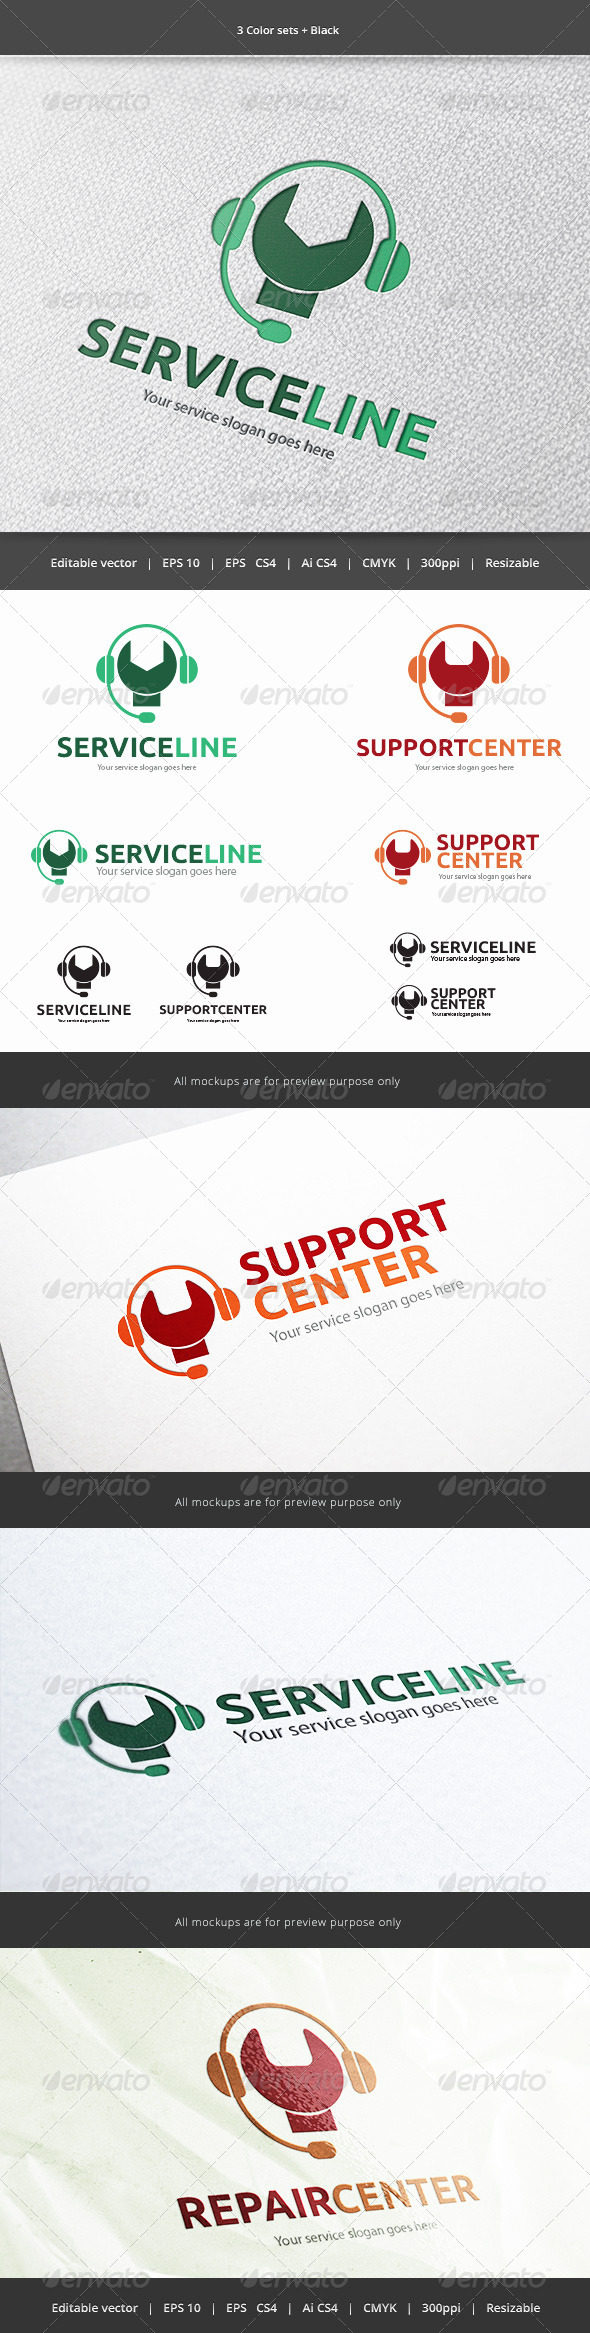 GraphicRiver Service Line Logo 5916393